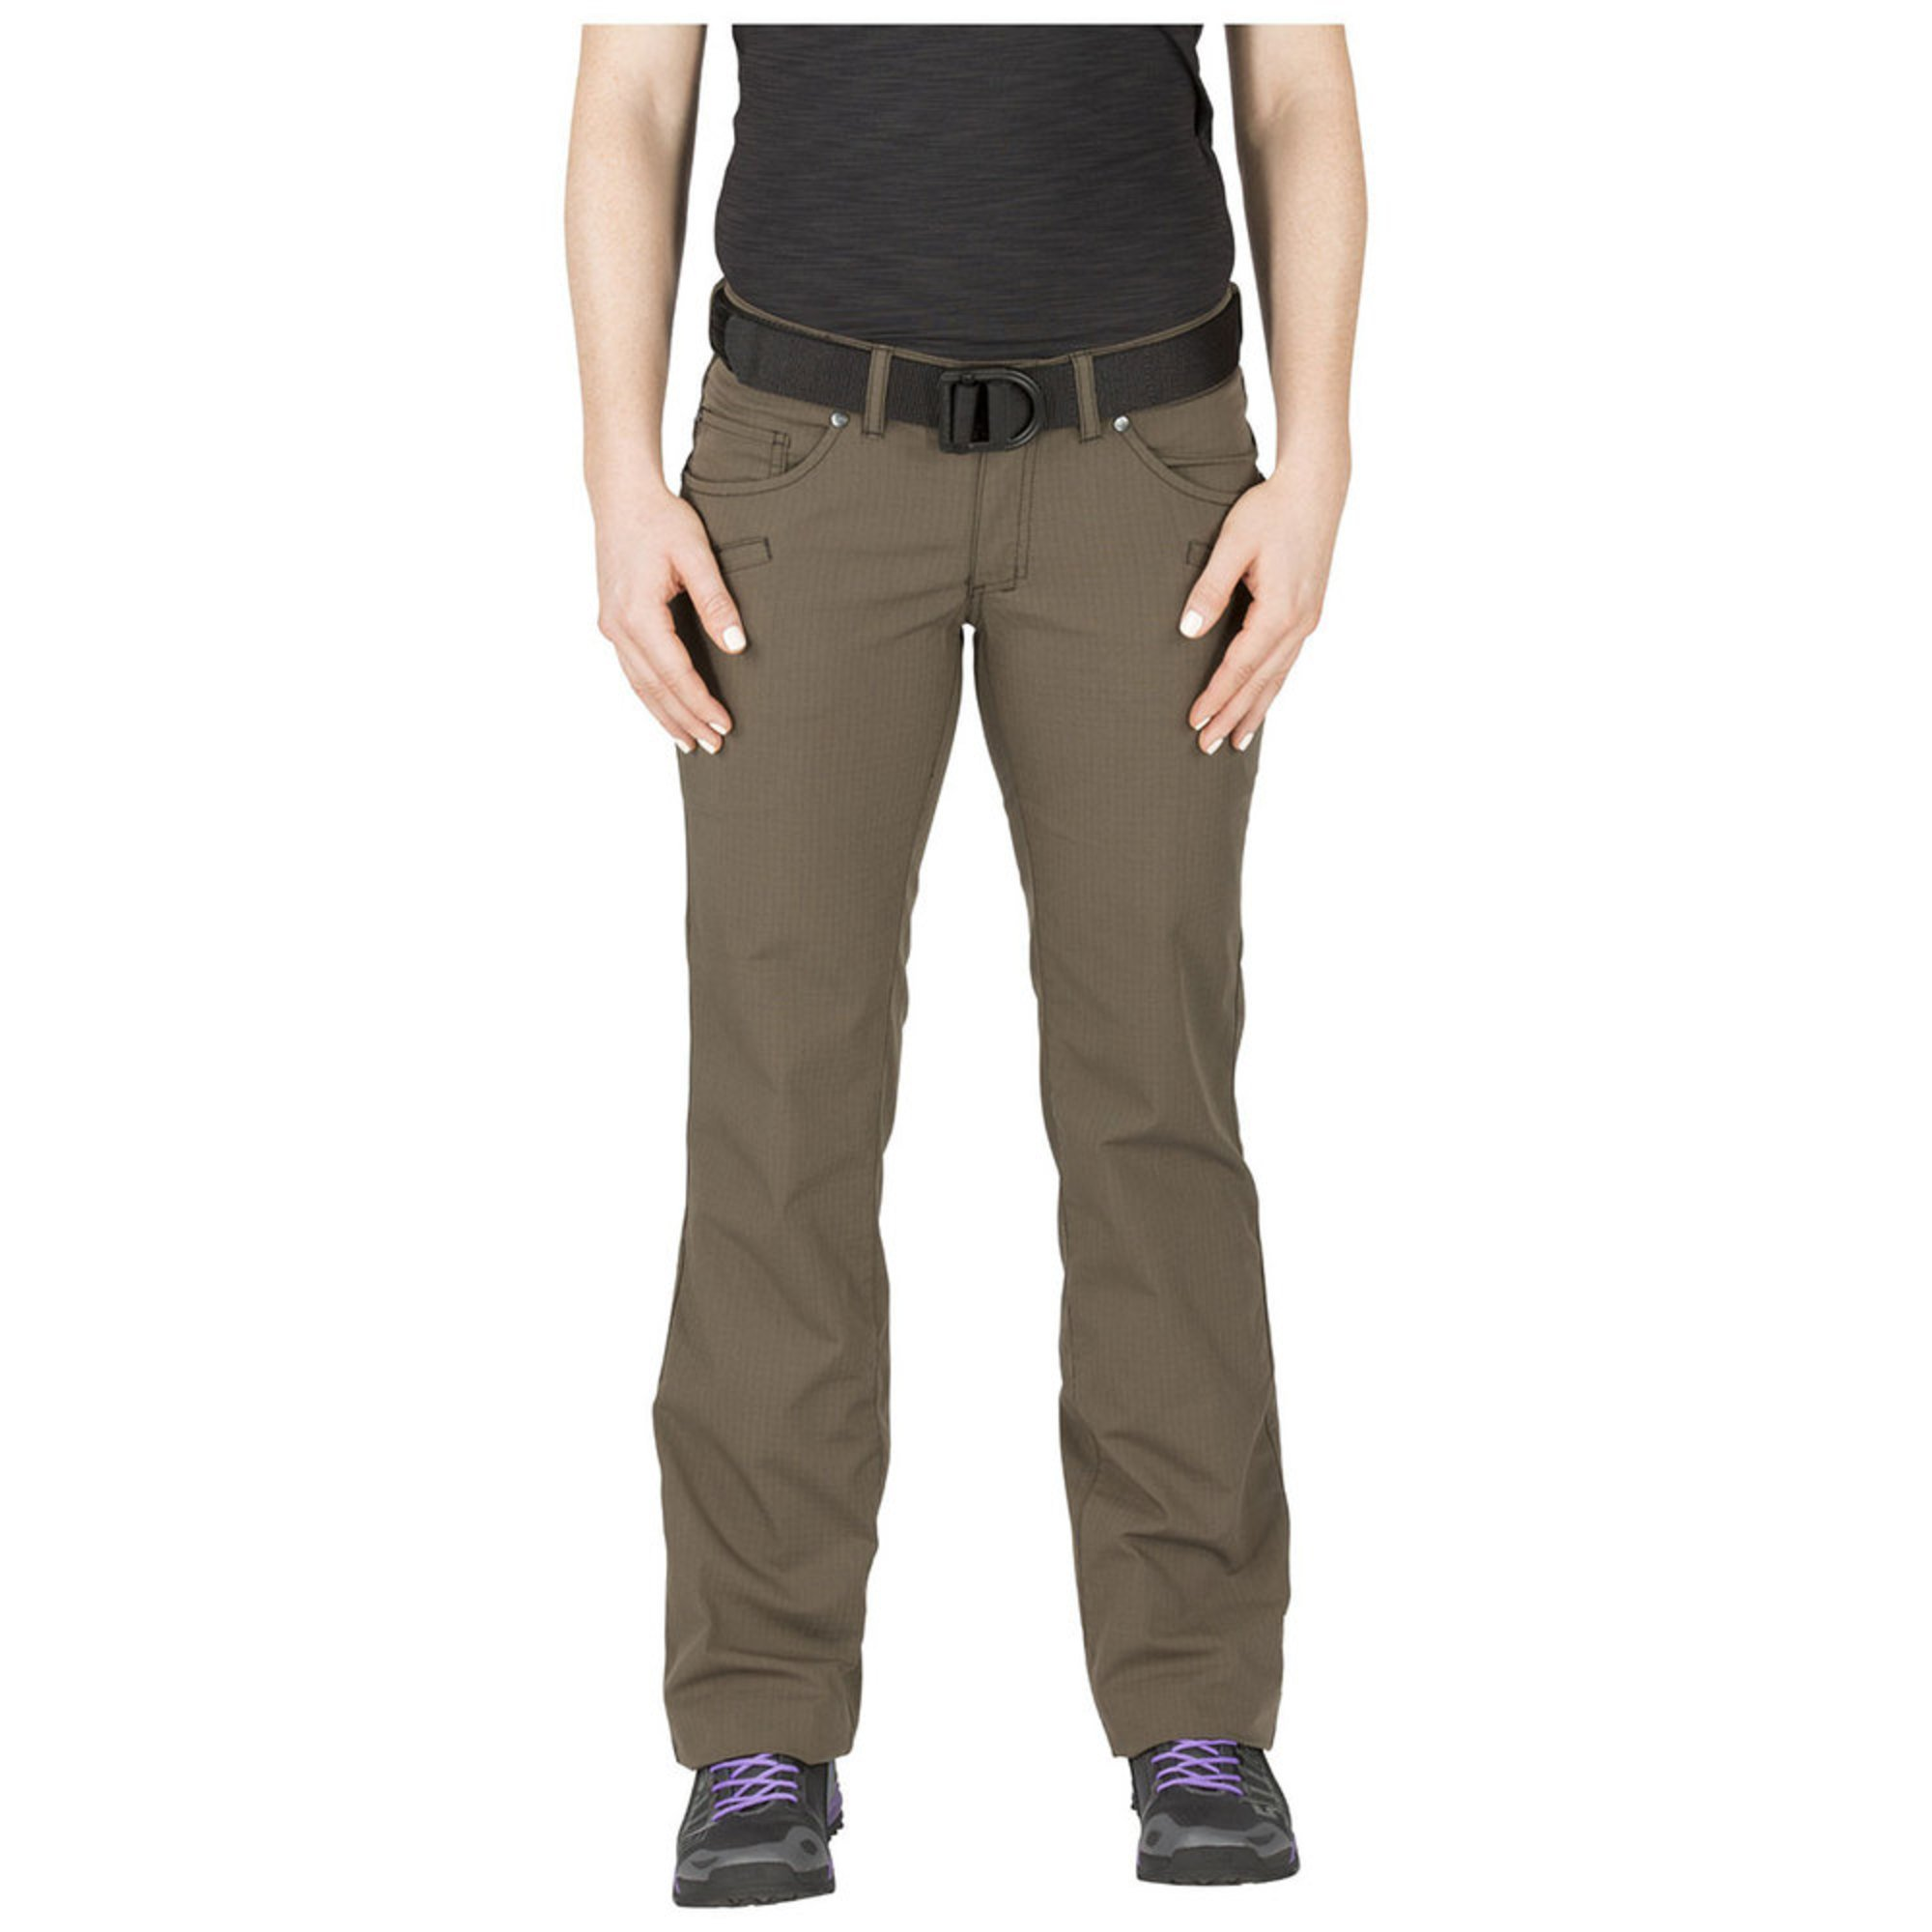 5.11 women/'s Cirrus pants